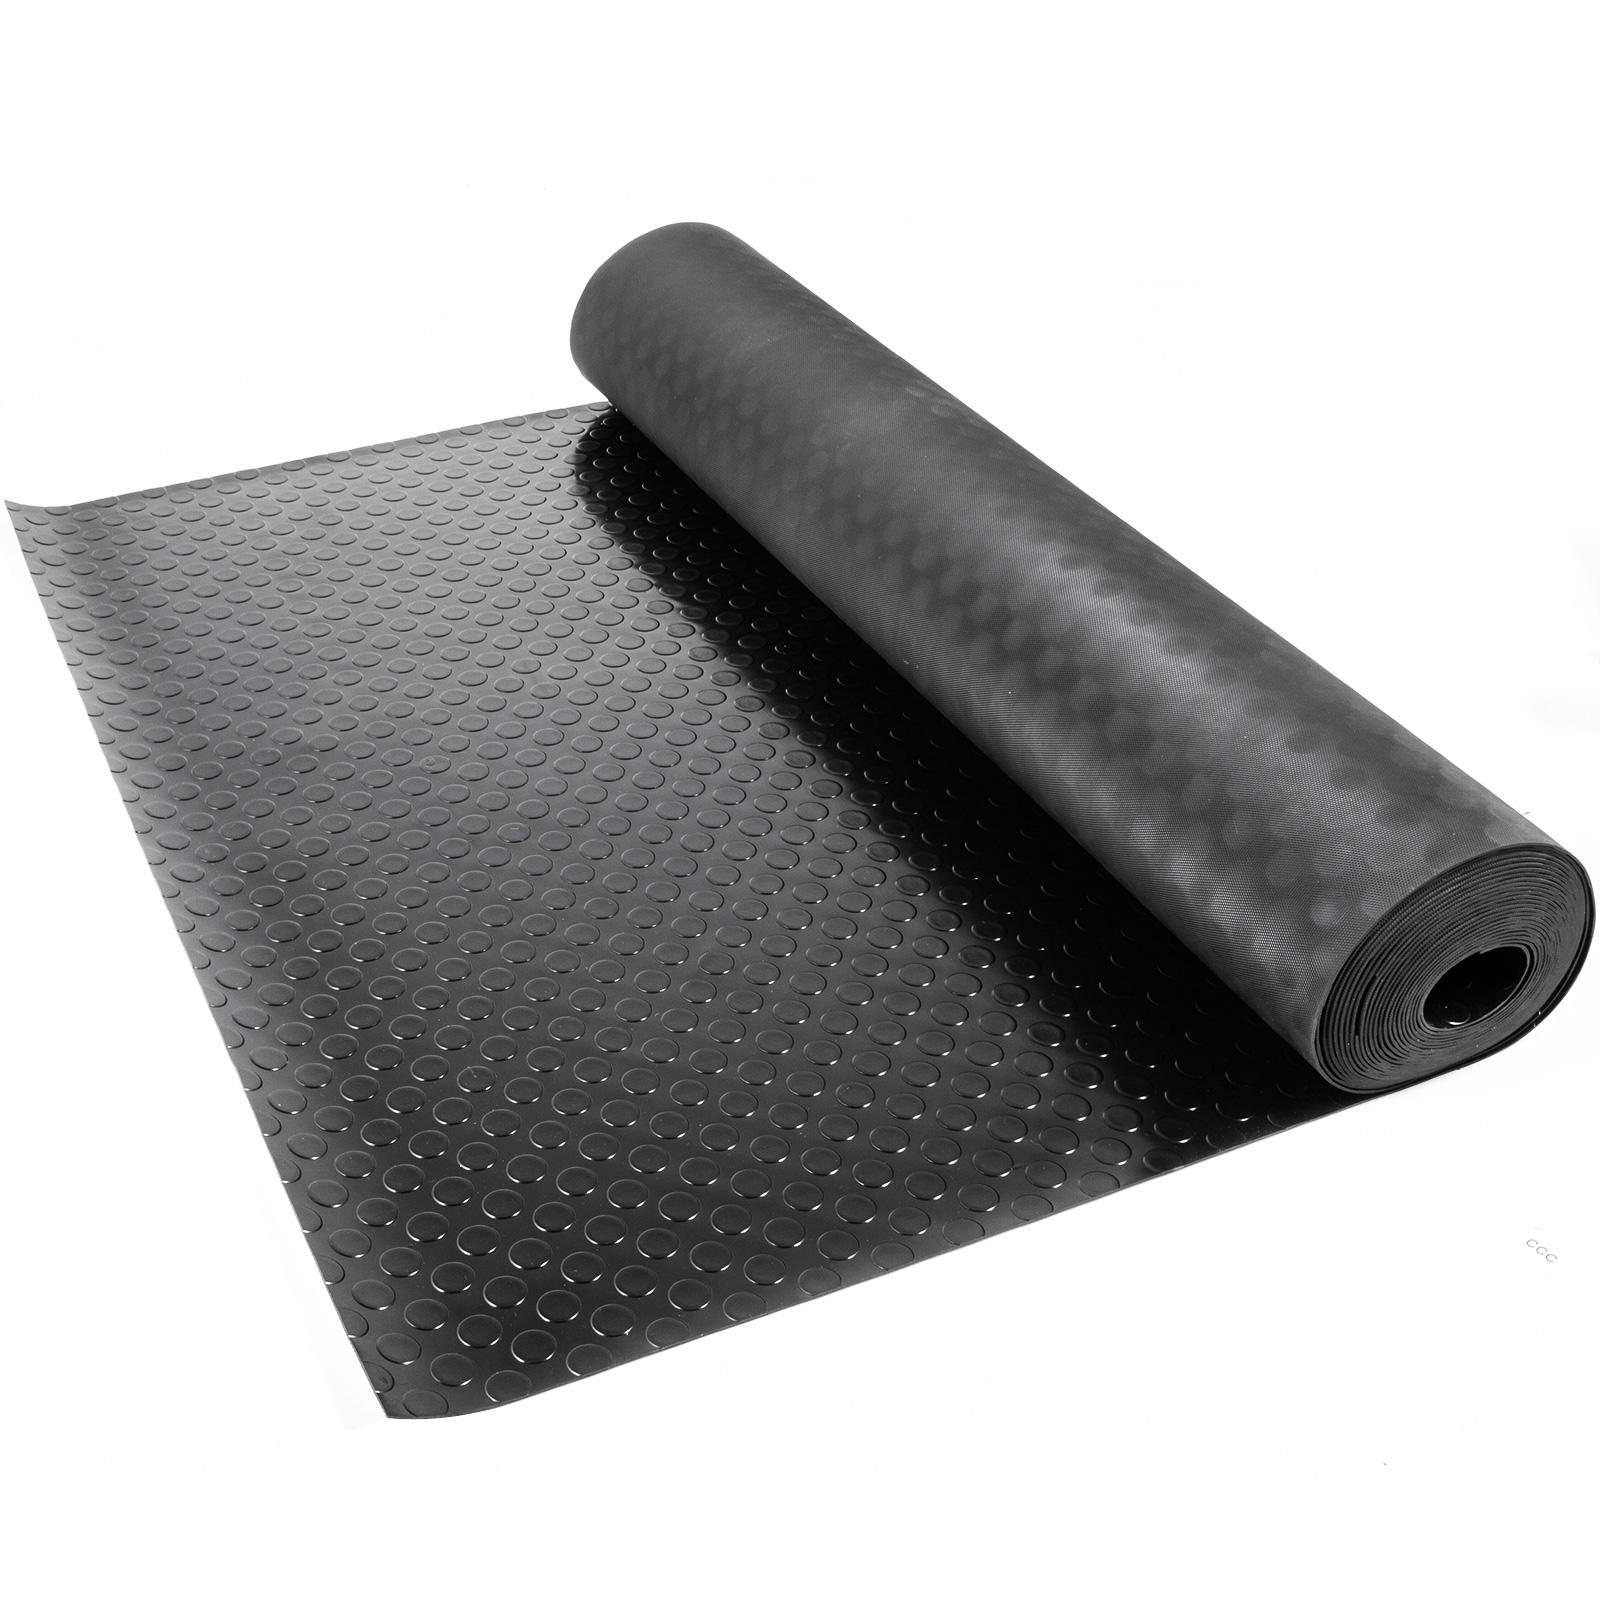 thumbnail 155 - Garage Flooring Mat Roll Car Trailer Floor Covering 1.1m Width Gym Floor Roll